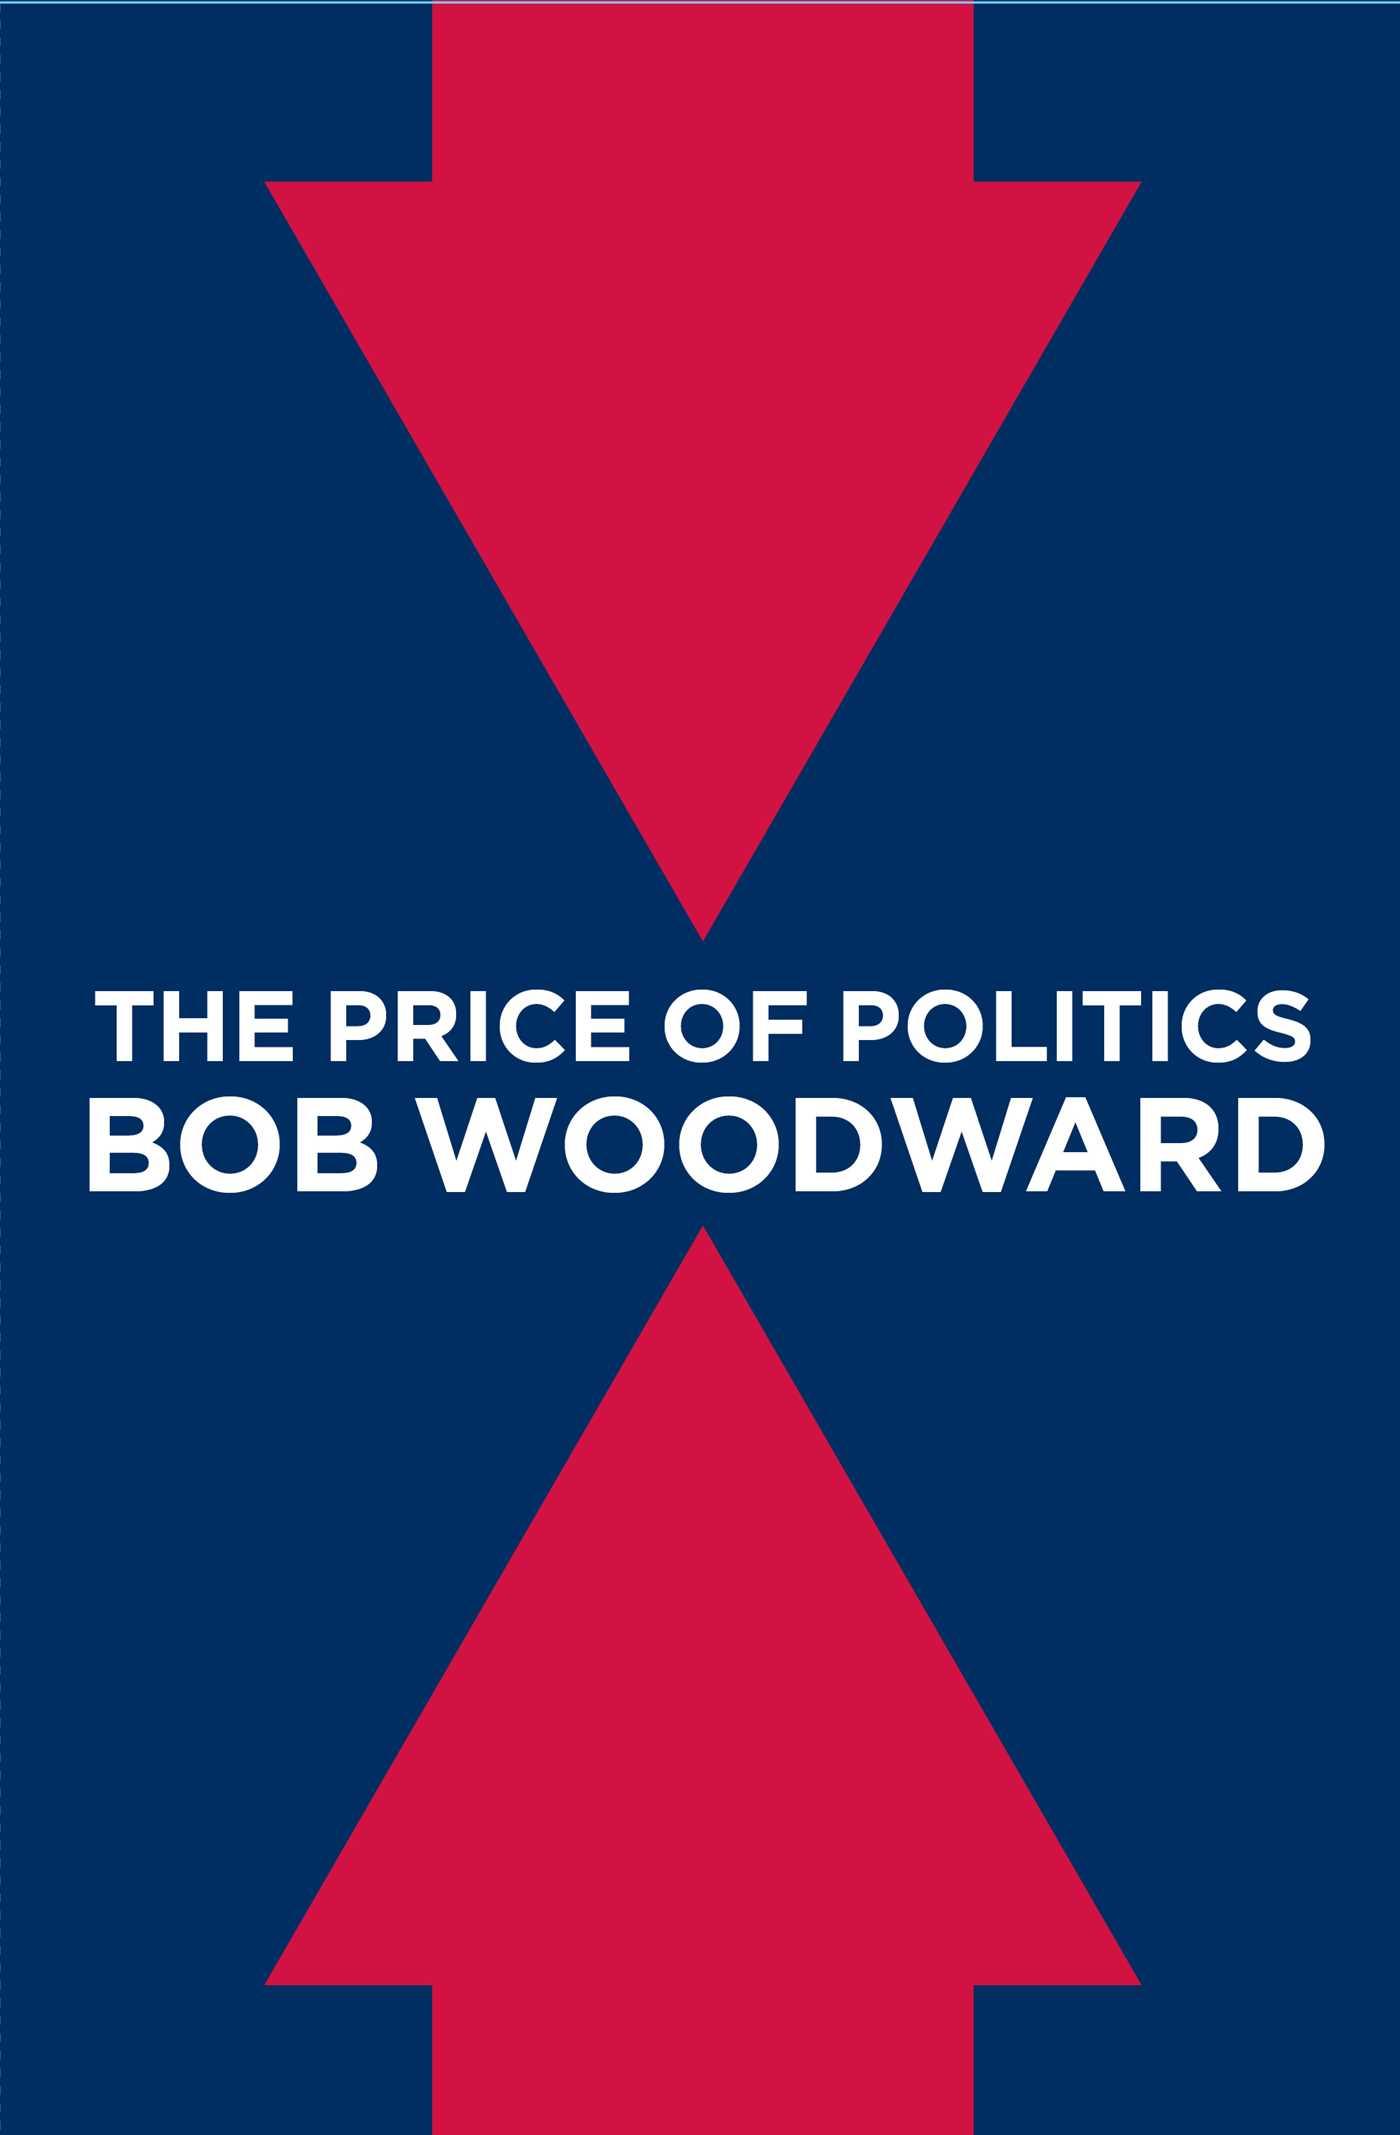 The price of politics 9781451651126 hr